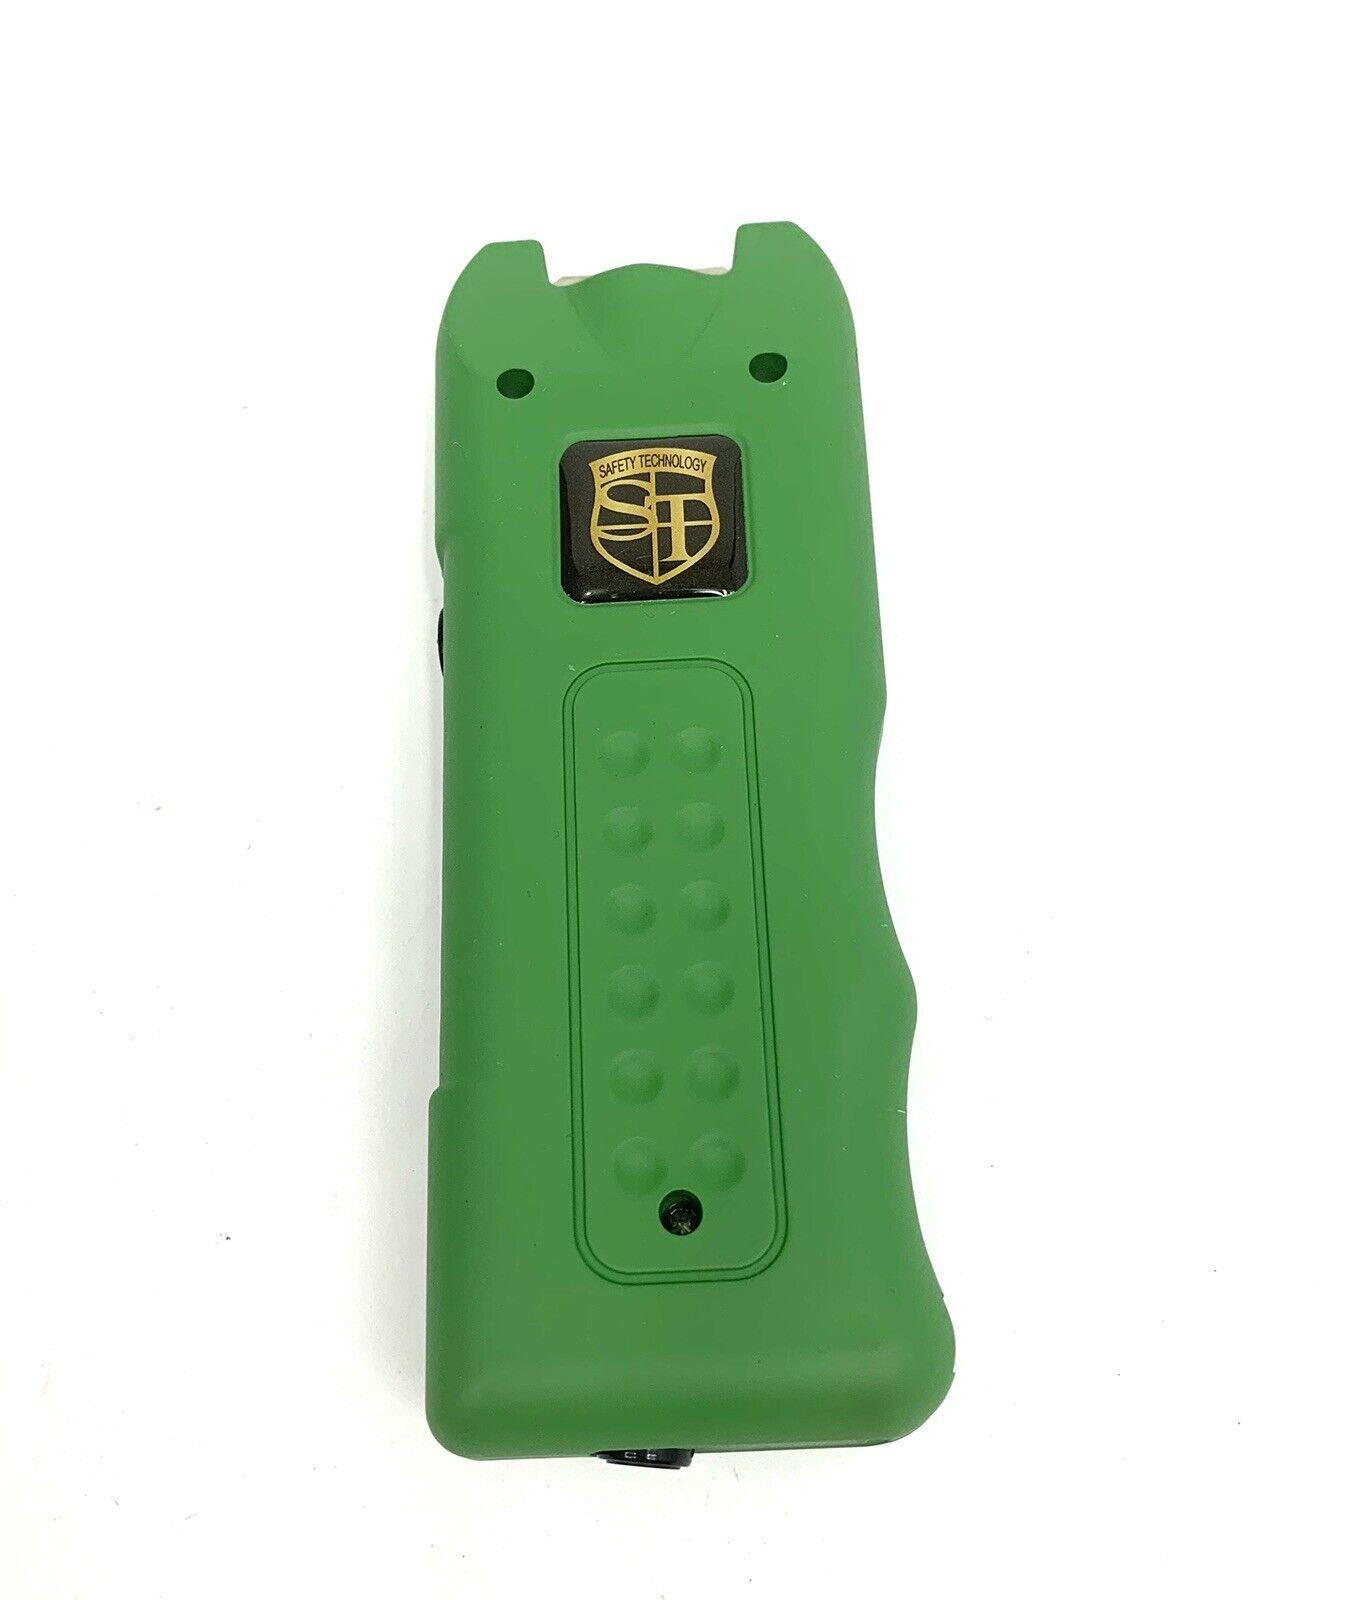 MULTIGUARD STUN GUN FLASHLIGHT W/ LOUD PERSONAL ALARM 20M VOLTS EASY OPERATION - $15.95